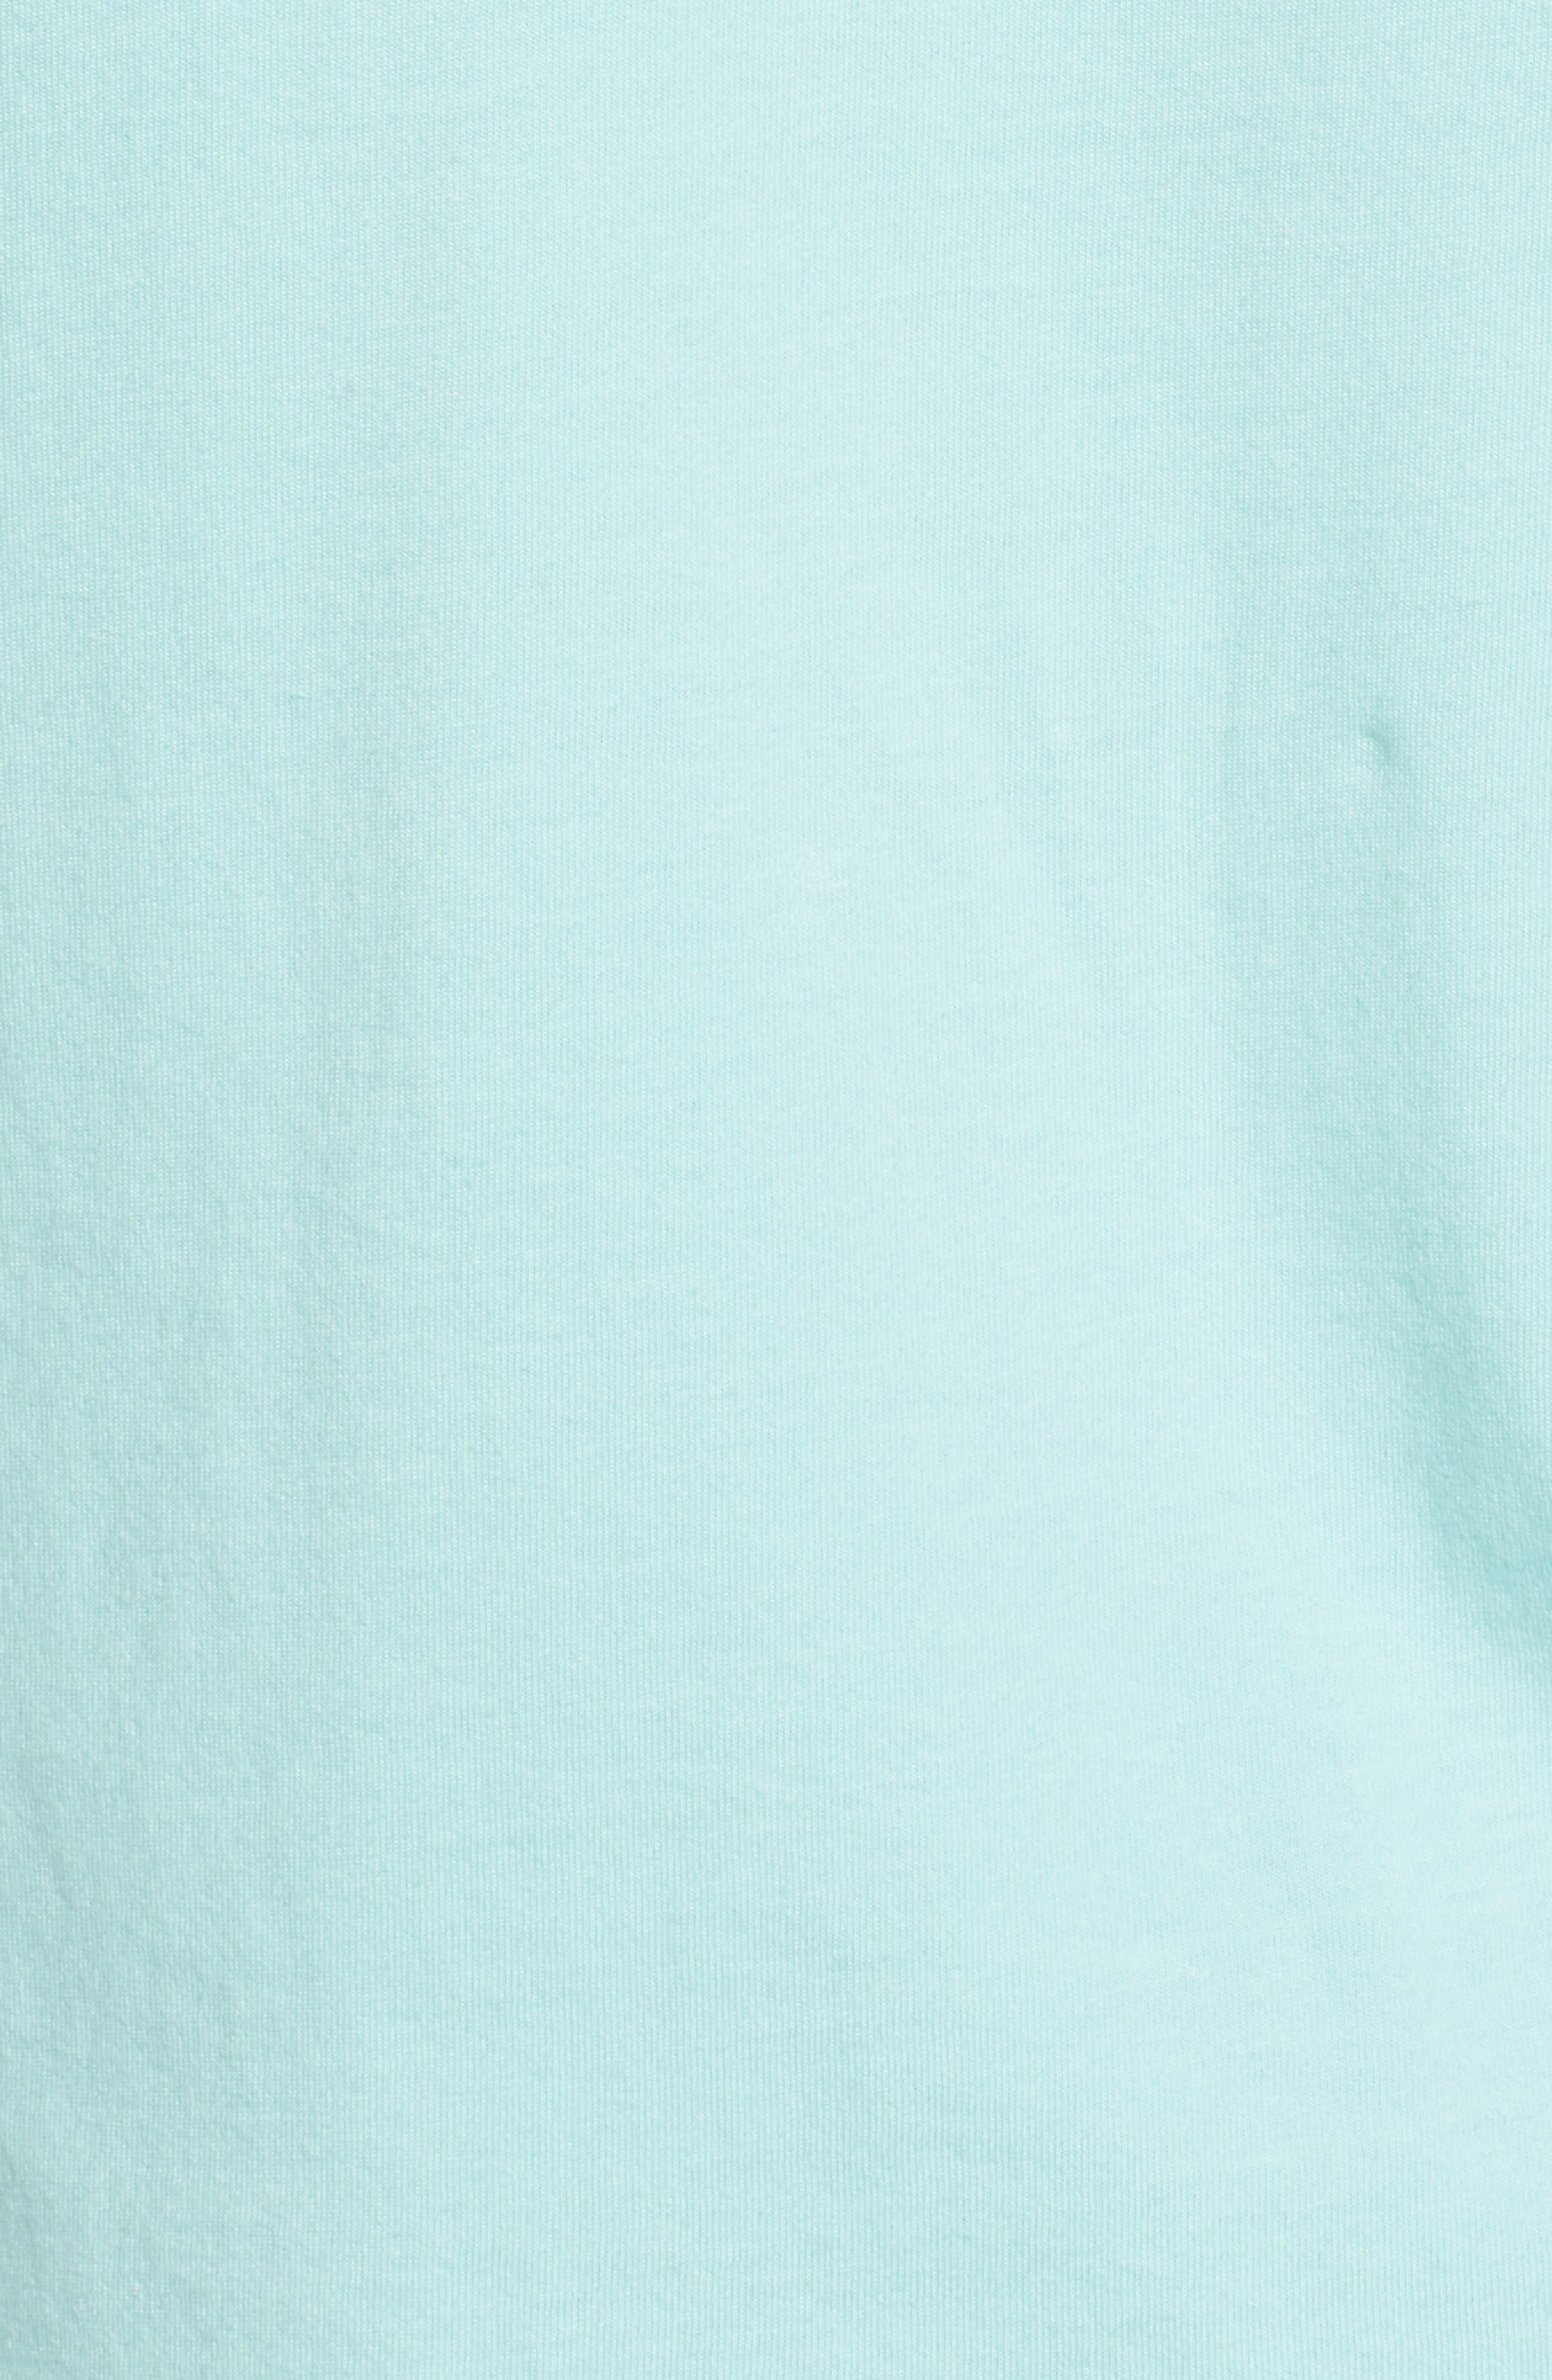 Southern Mix Crewneck T-Shirt,                             Alternate thumbnail 5, color,                             376